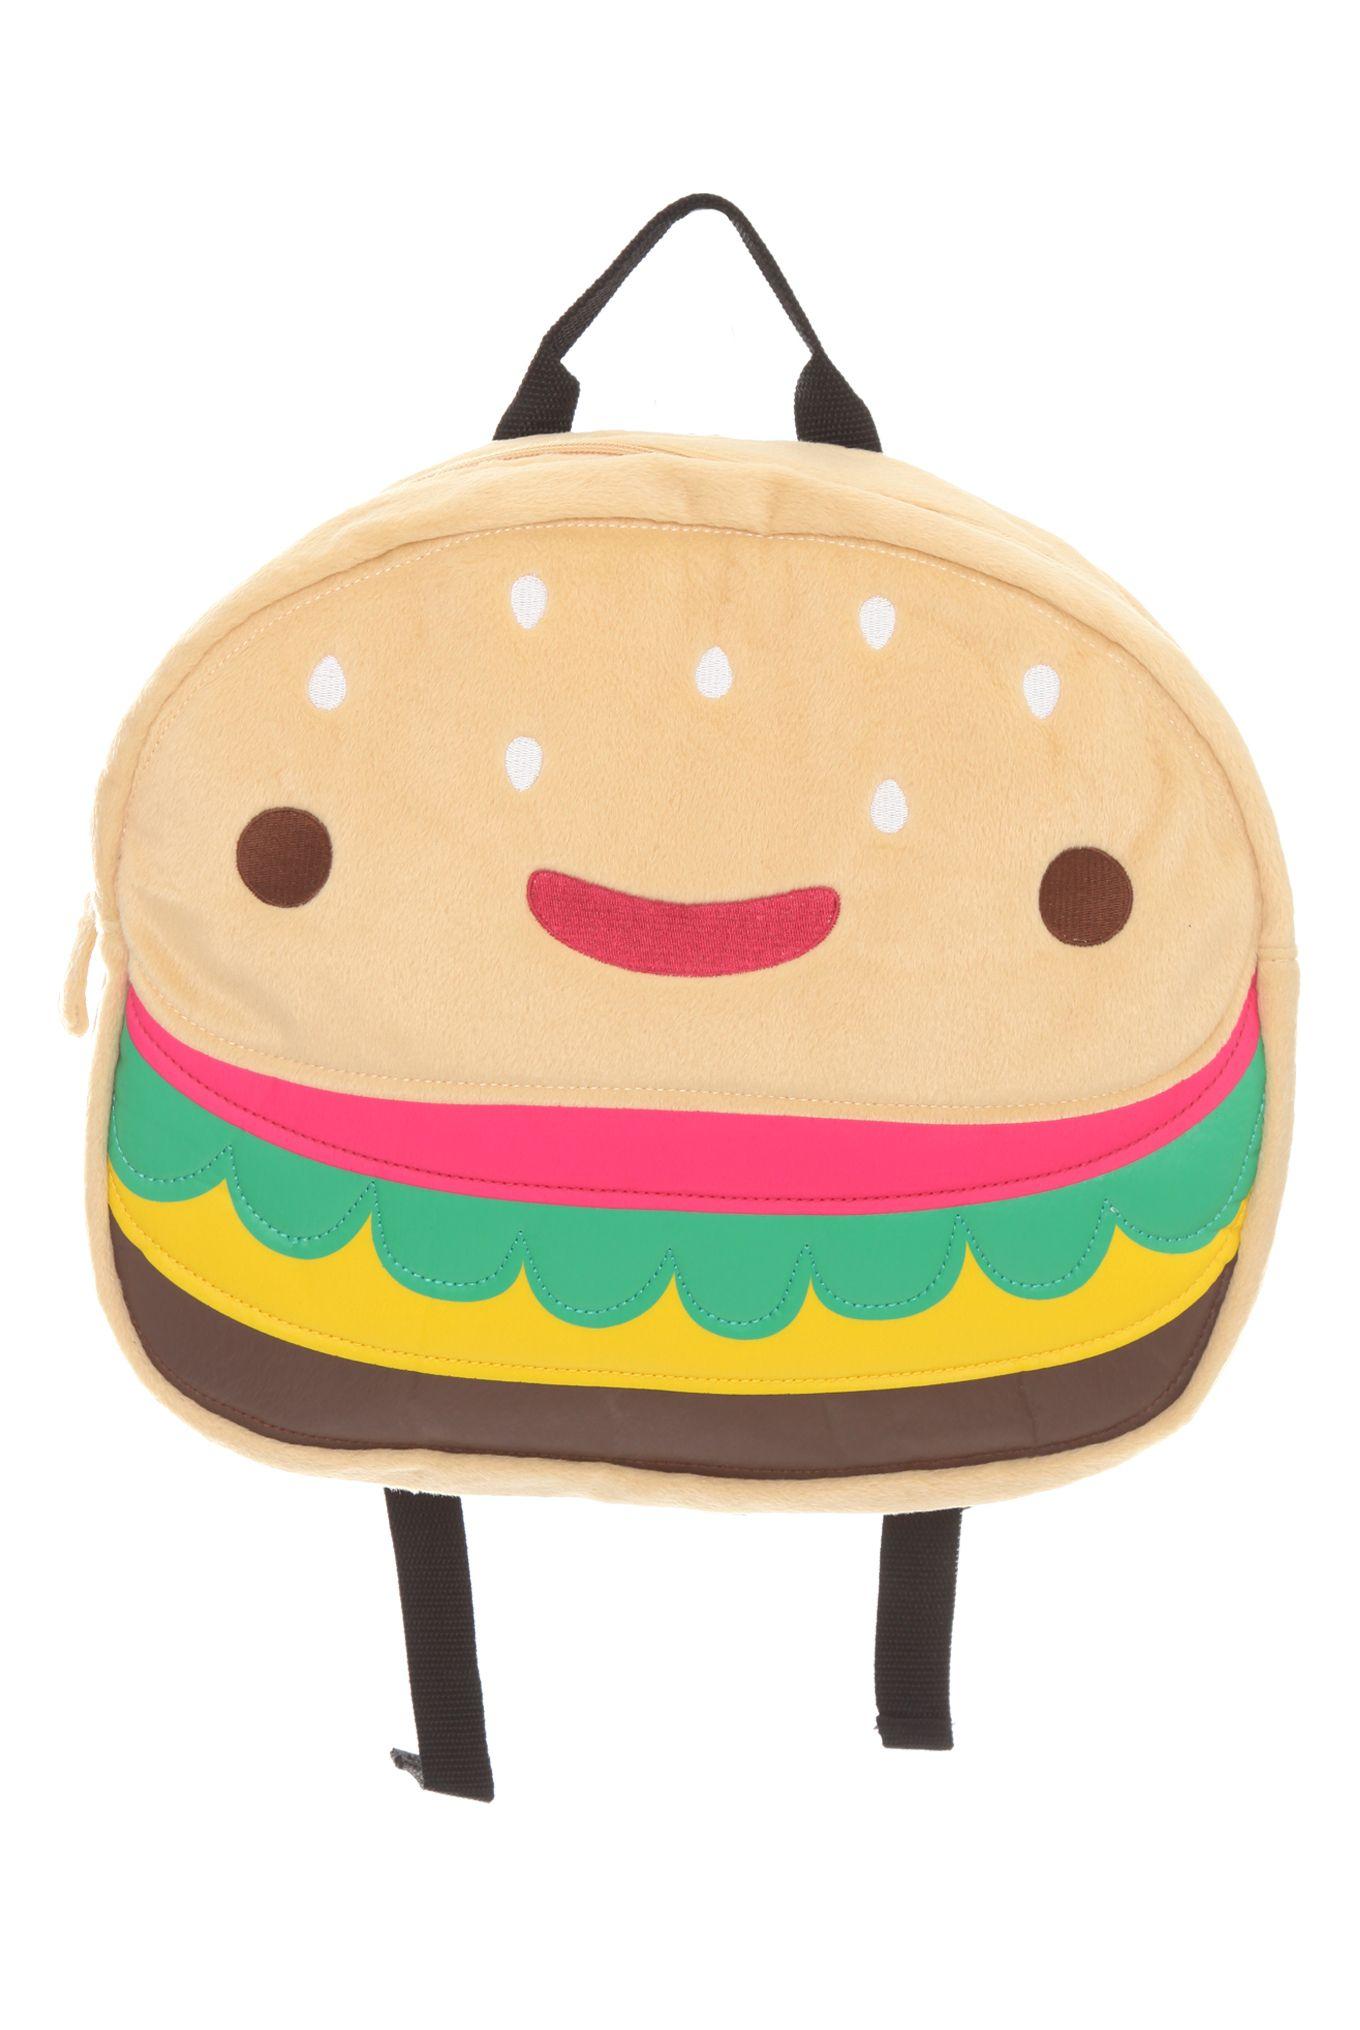 Cheeseburger Book Bag